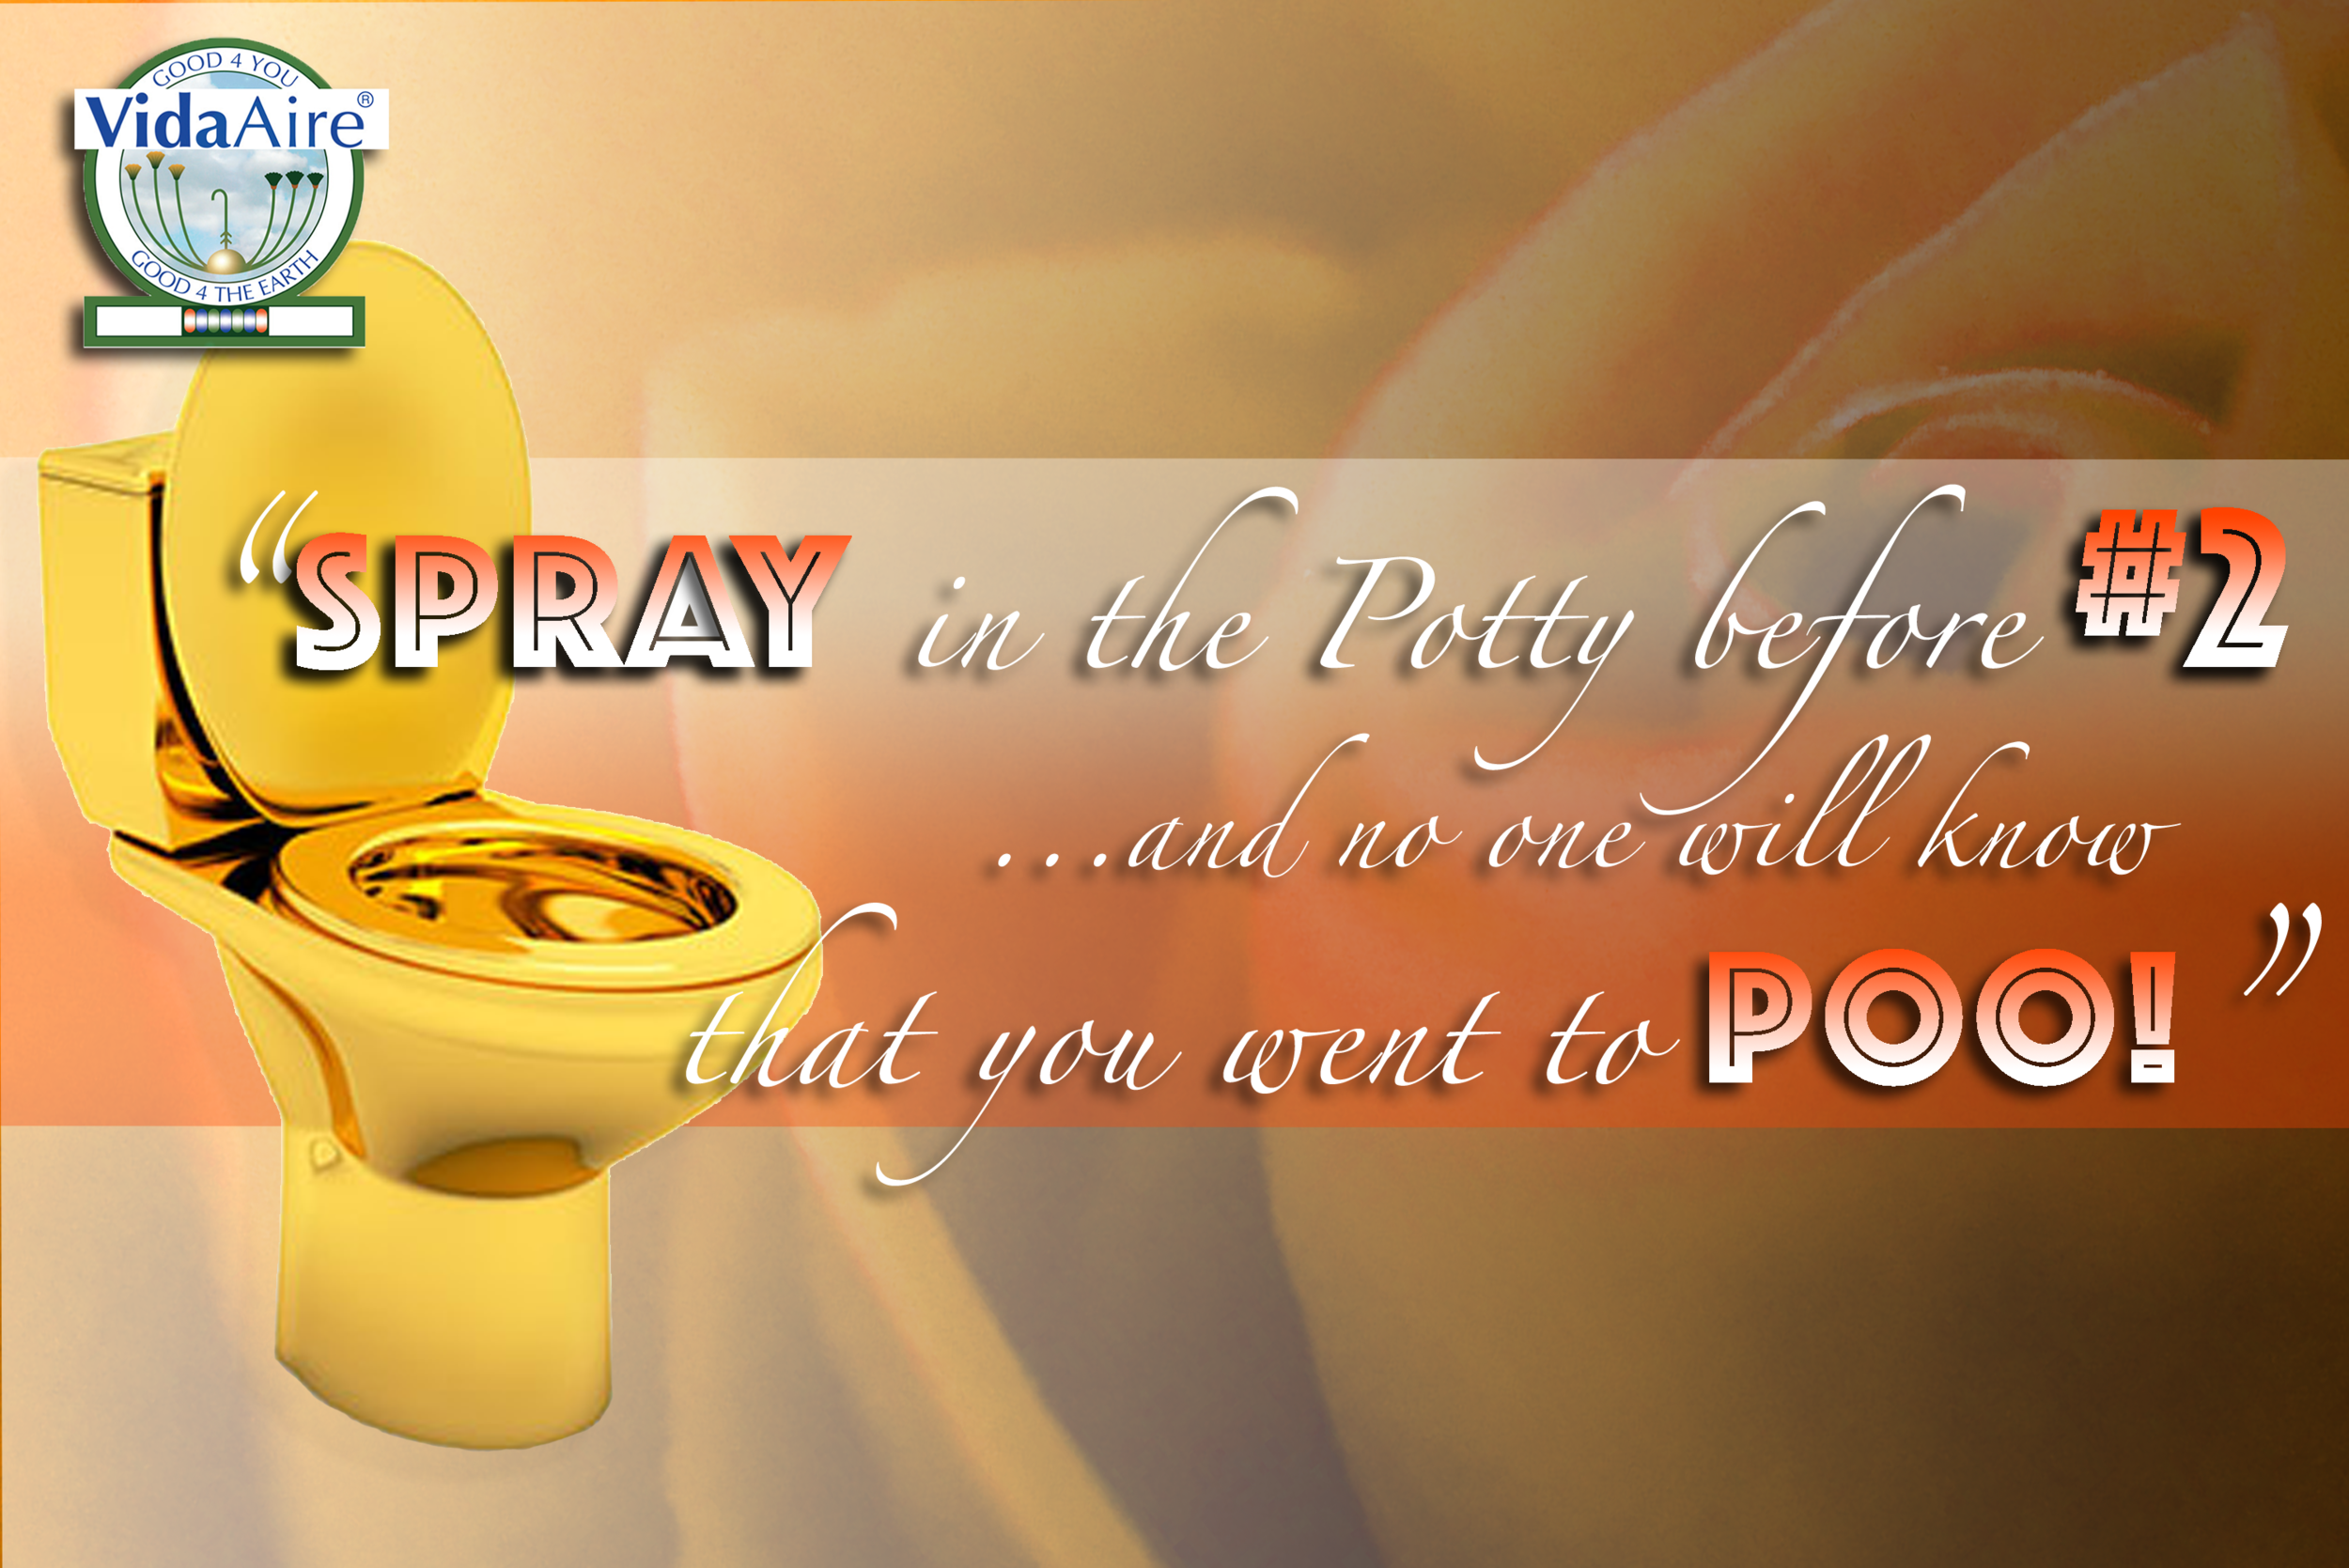 sprayinthepotty.png